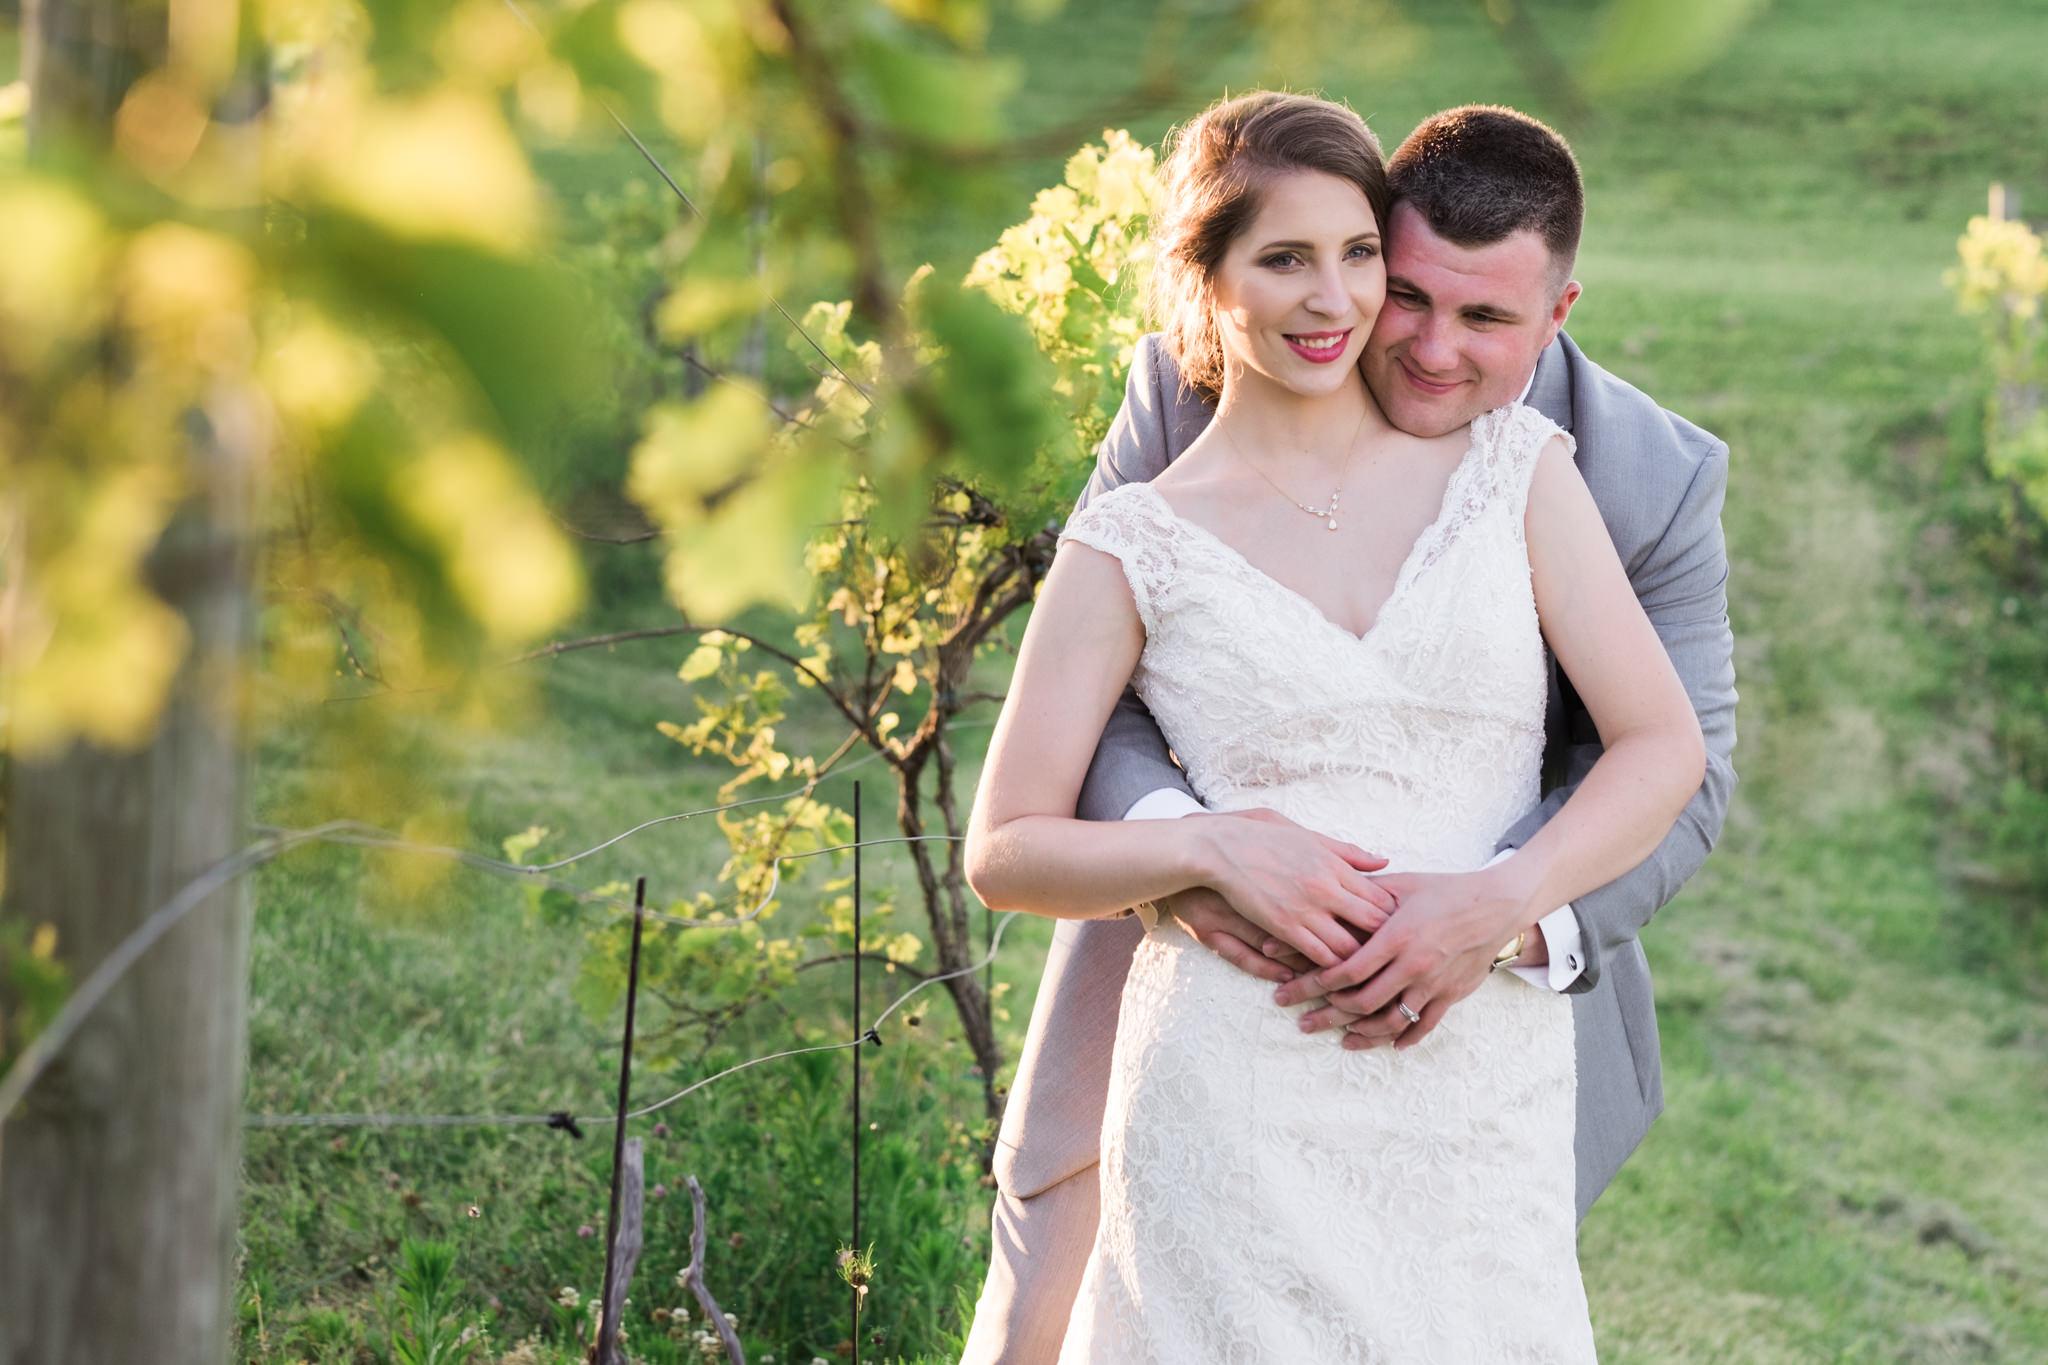 2017.06.03_Callie&Dustin_Wedding_Blog_0061.jpg